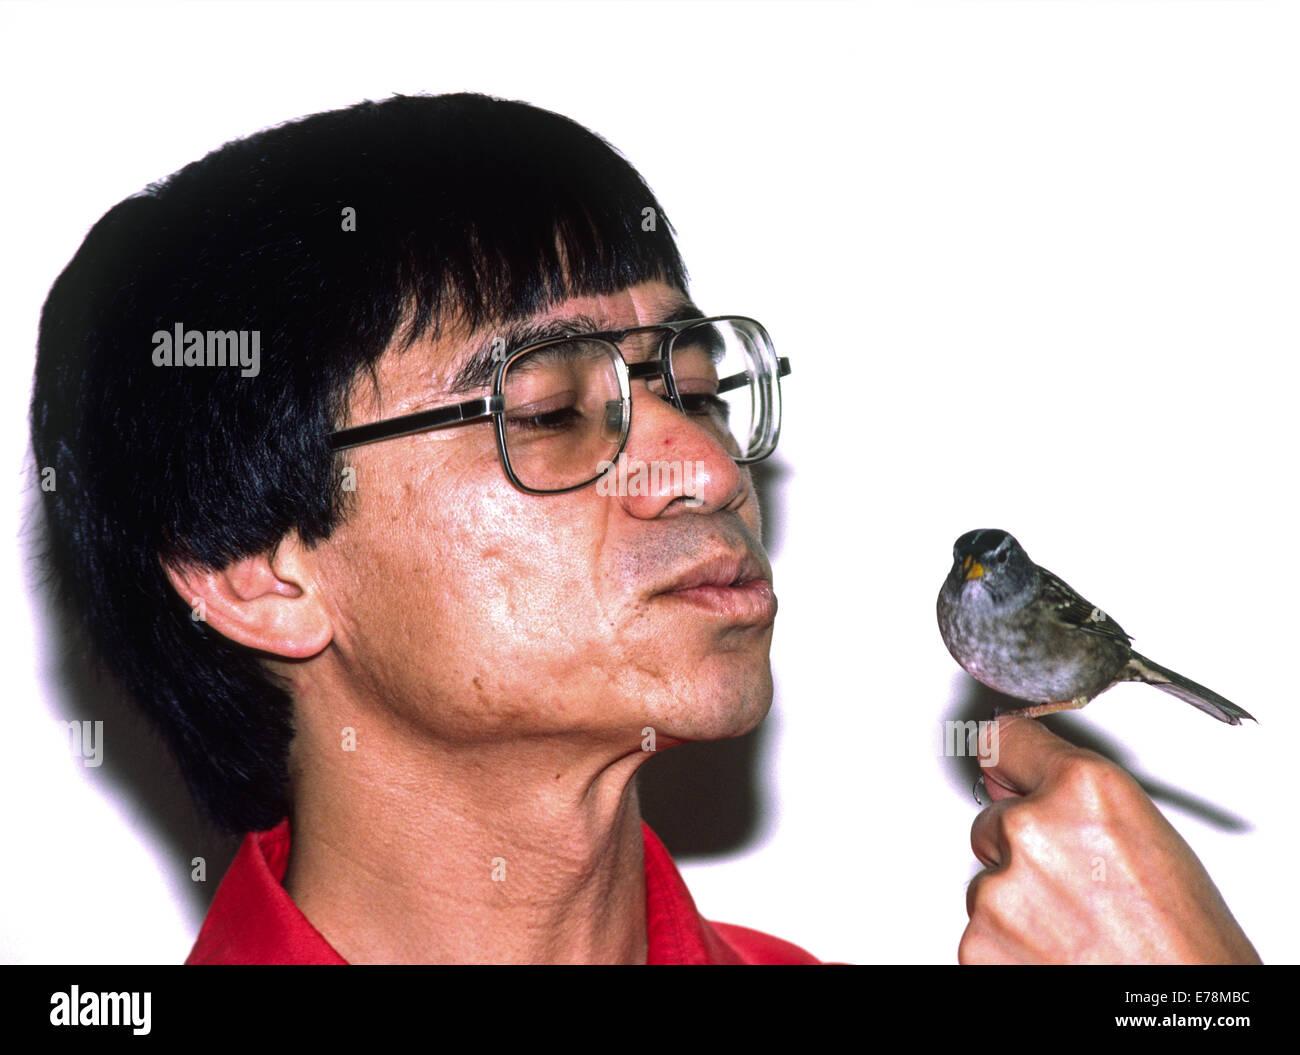 Luis Baptista, ornithologist, California Academy of Sciences - Stock Image